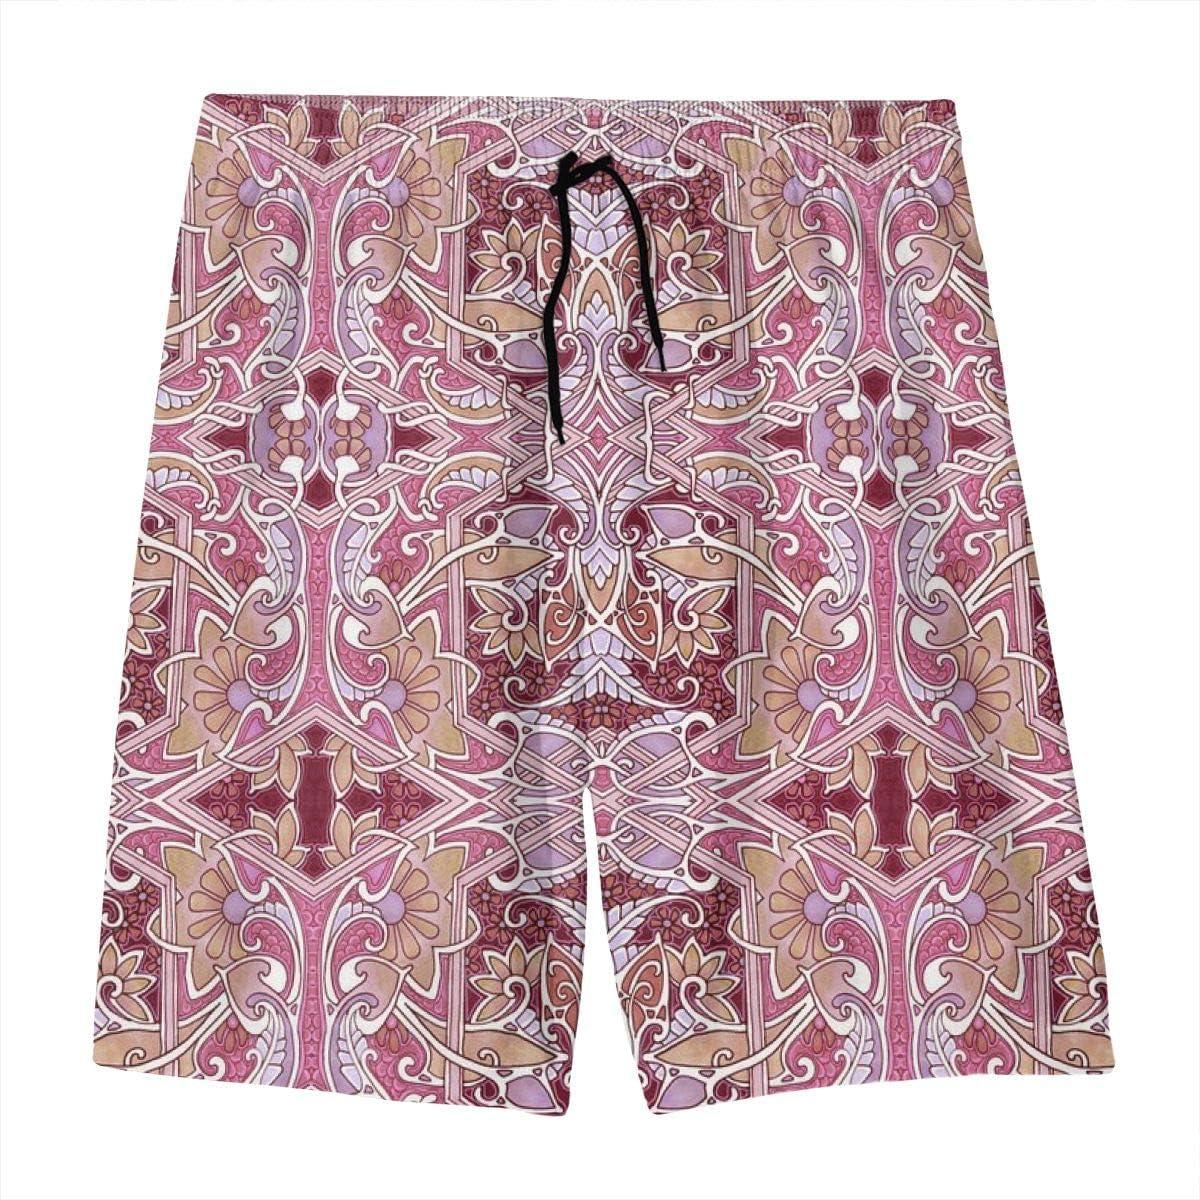 Boys Trunks Swimwear,King Arthurs Paisley Garden/_2094